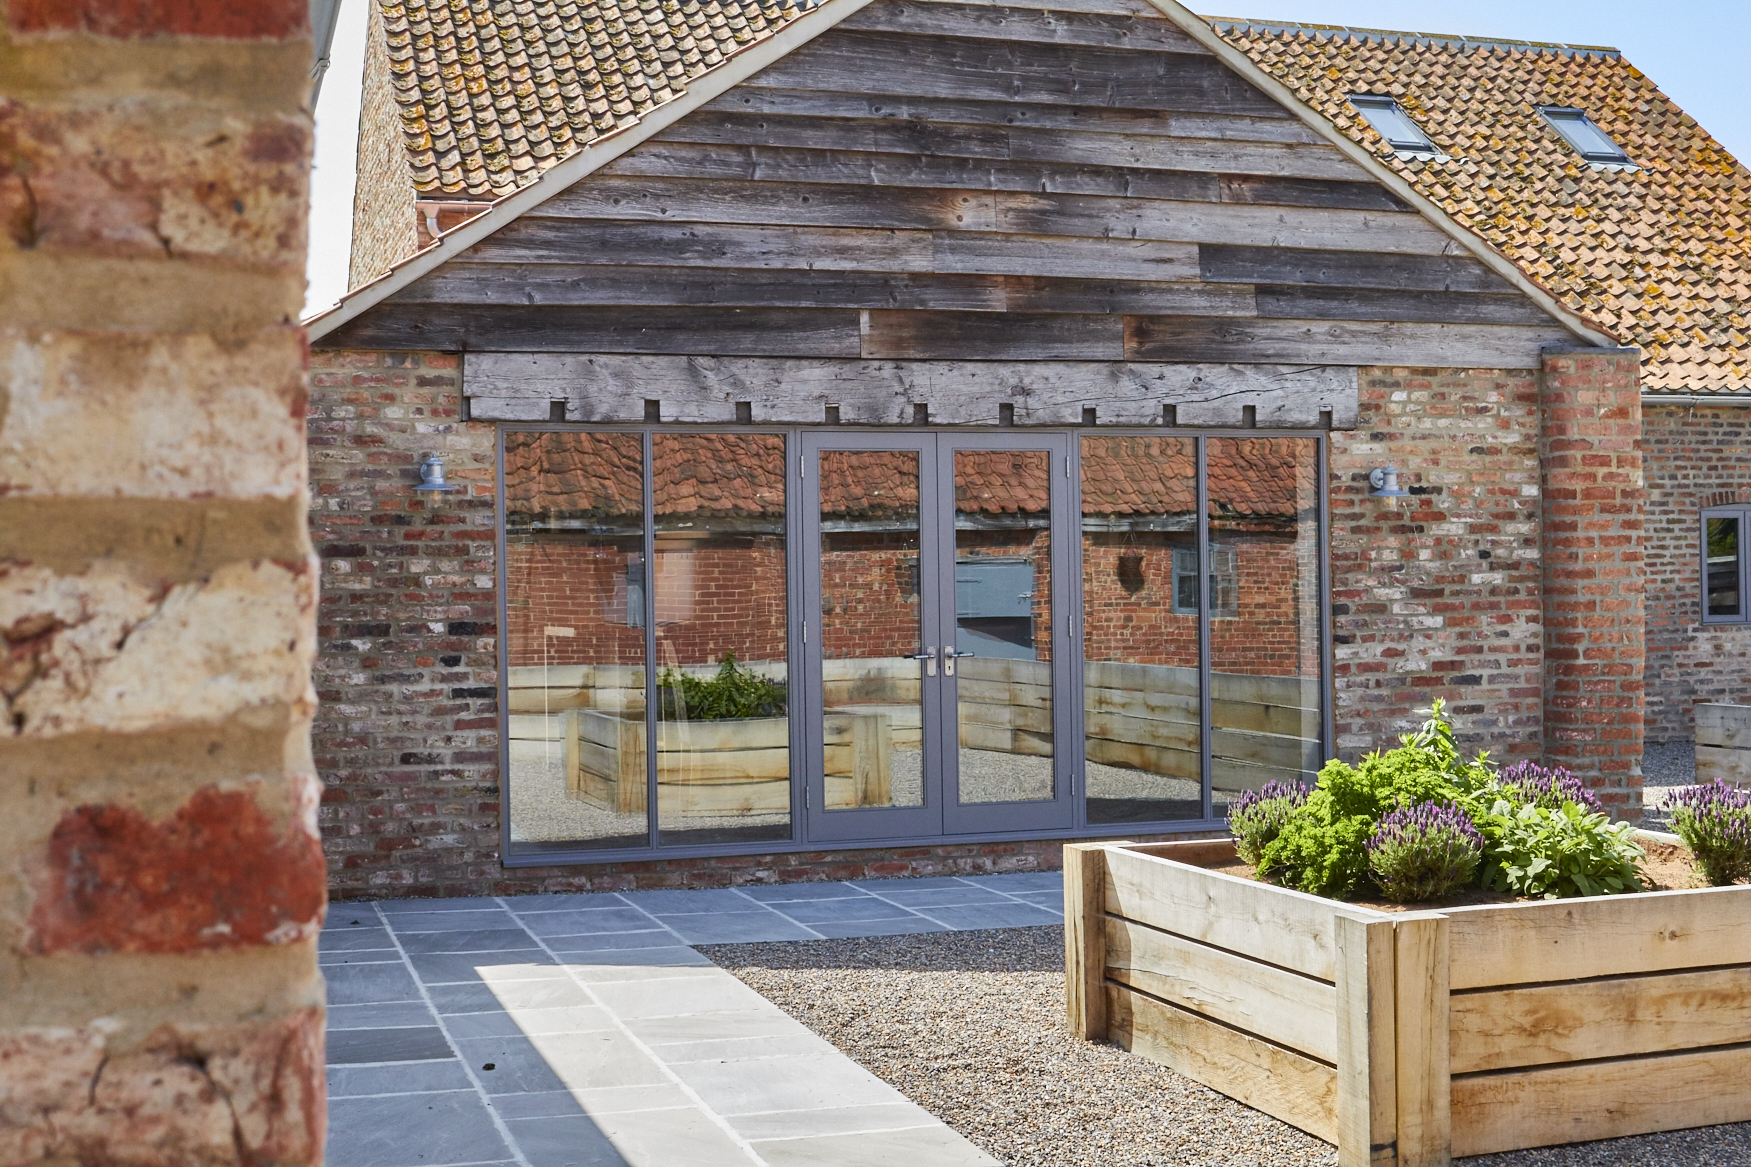 Moor Monkton Barn outdoor cladding